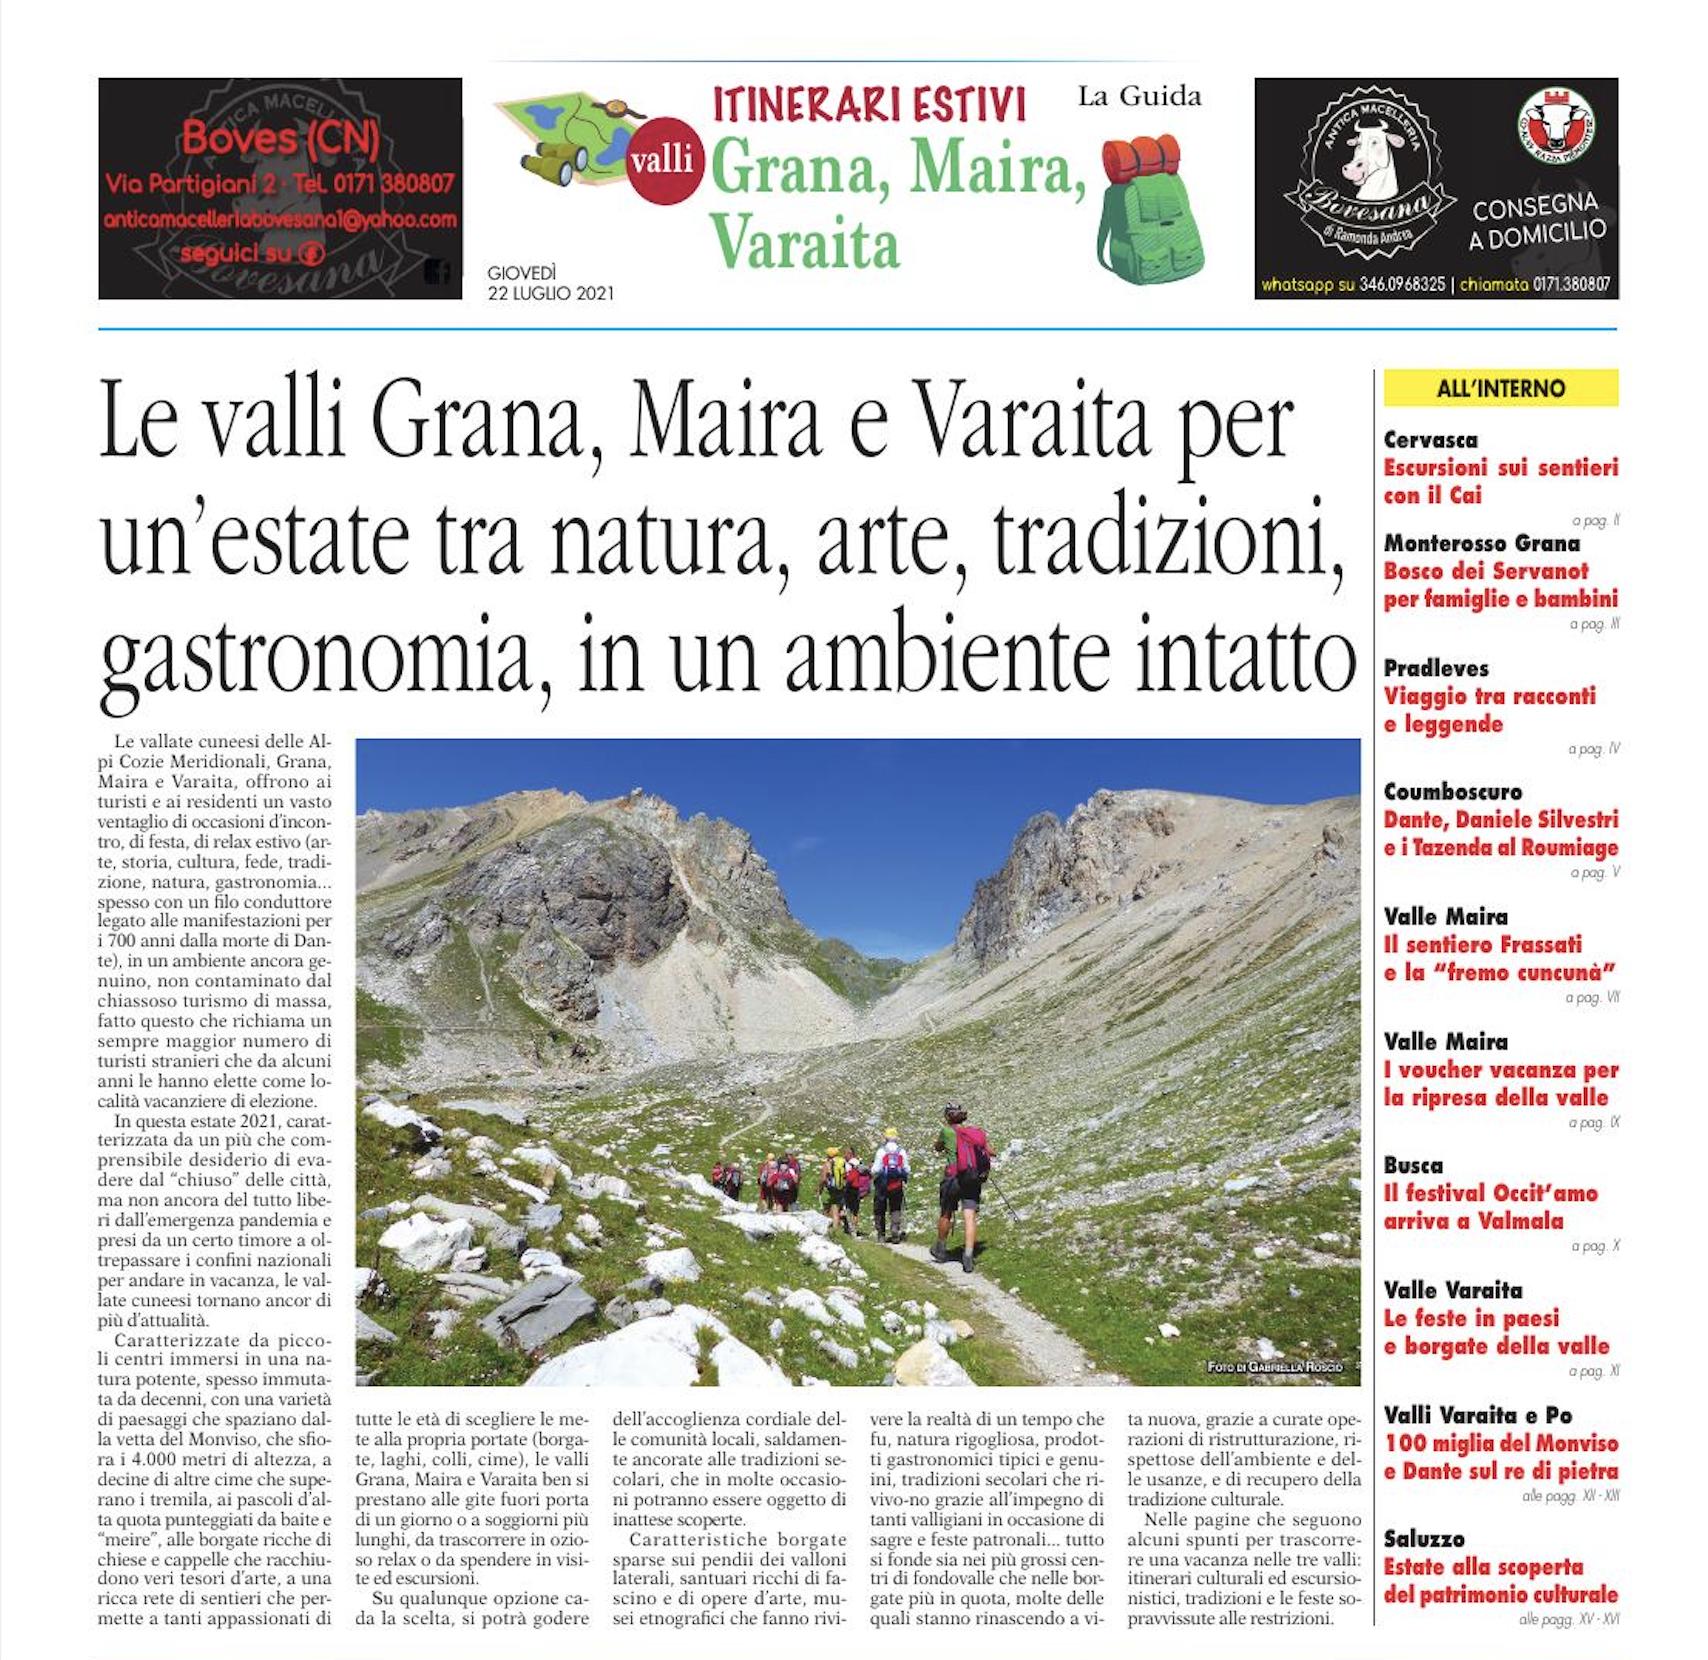 Speciale valli Grana, Maira, Varaita